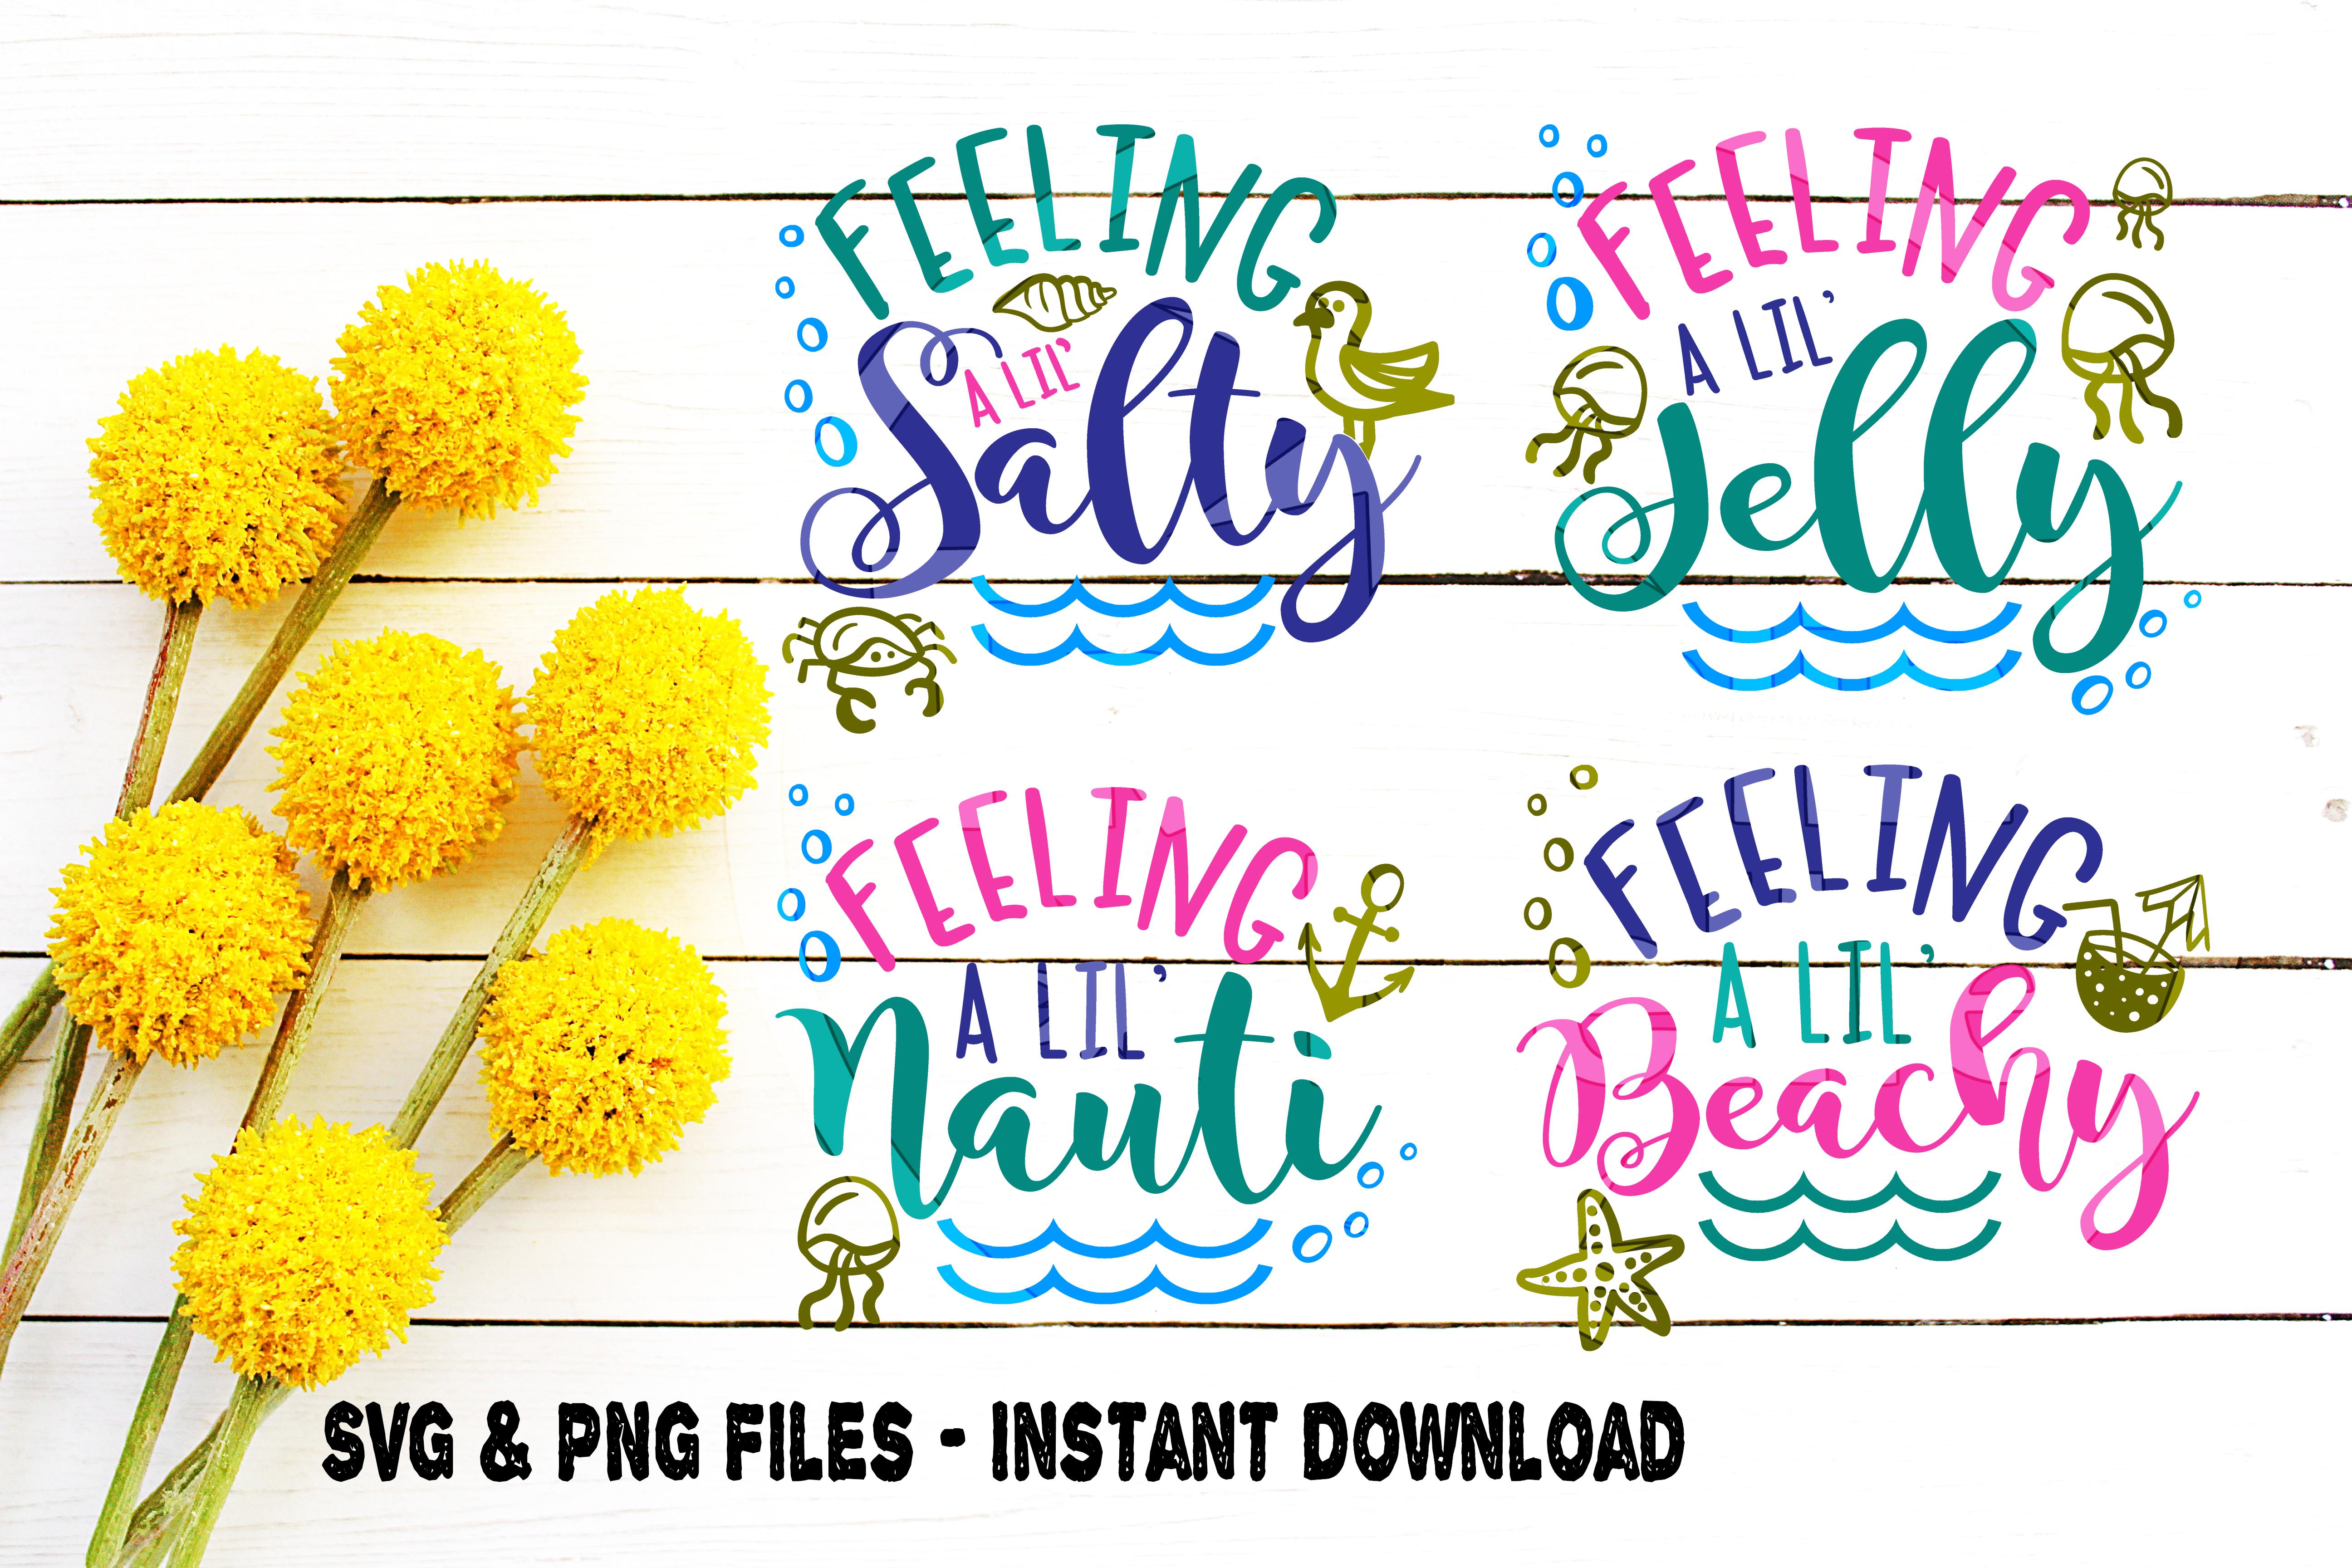 SVG Beach Bundle, 4, Beach Moods svg, Emotions svg, Feeling Nauti svg, Feeling Beachy svg, Feeling Jelly svg, Feeling Salty svg, Cut File example image 1